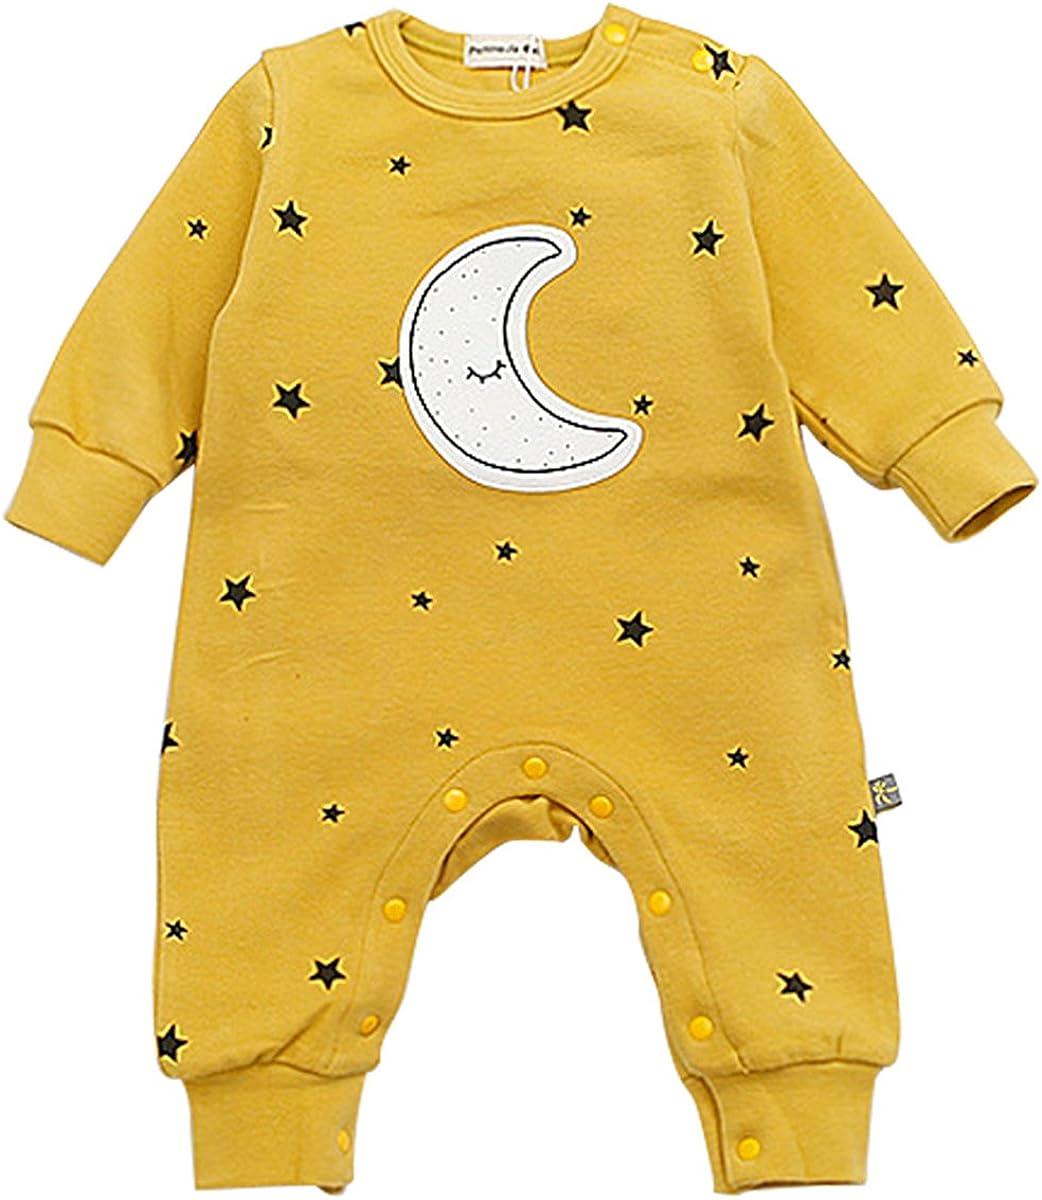 Bebone B/éb/é Barboteuse gar/çons Filles Pyjama /étoiles et Lune v/êtements de b/éb/é